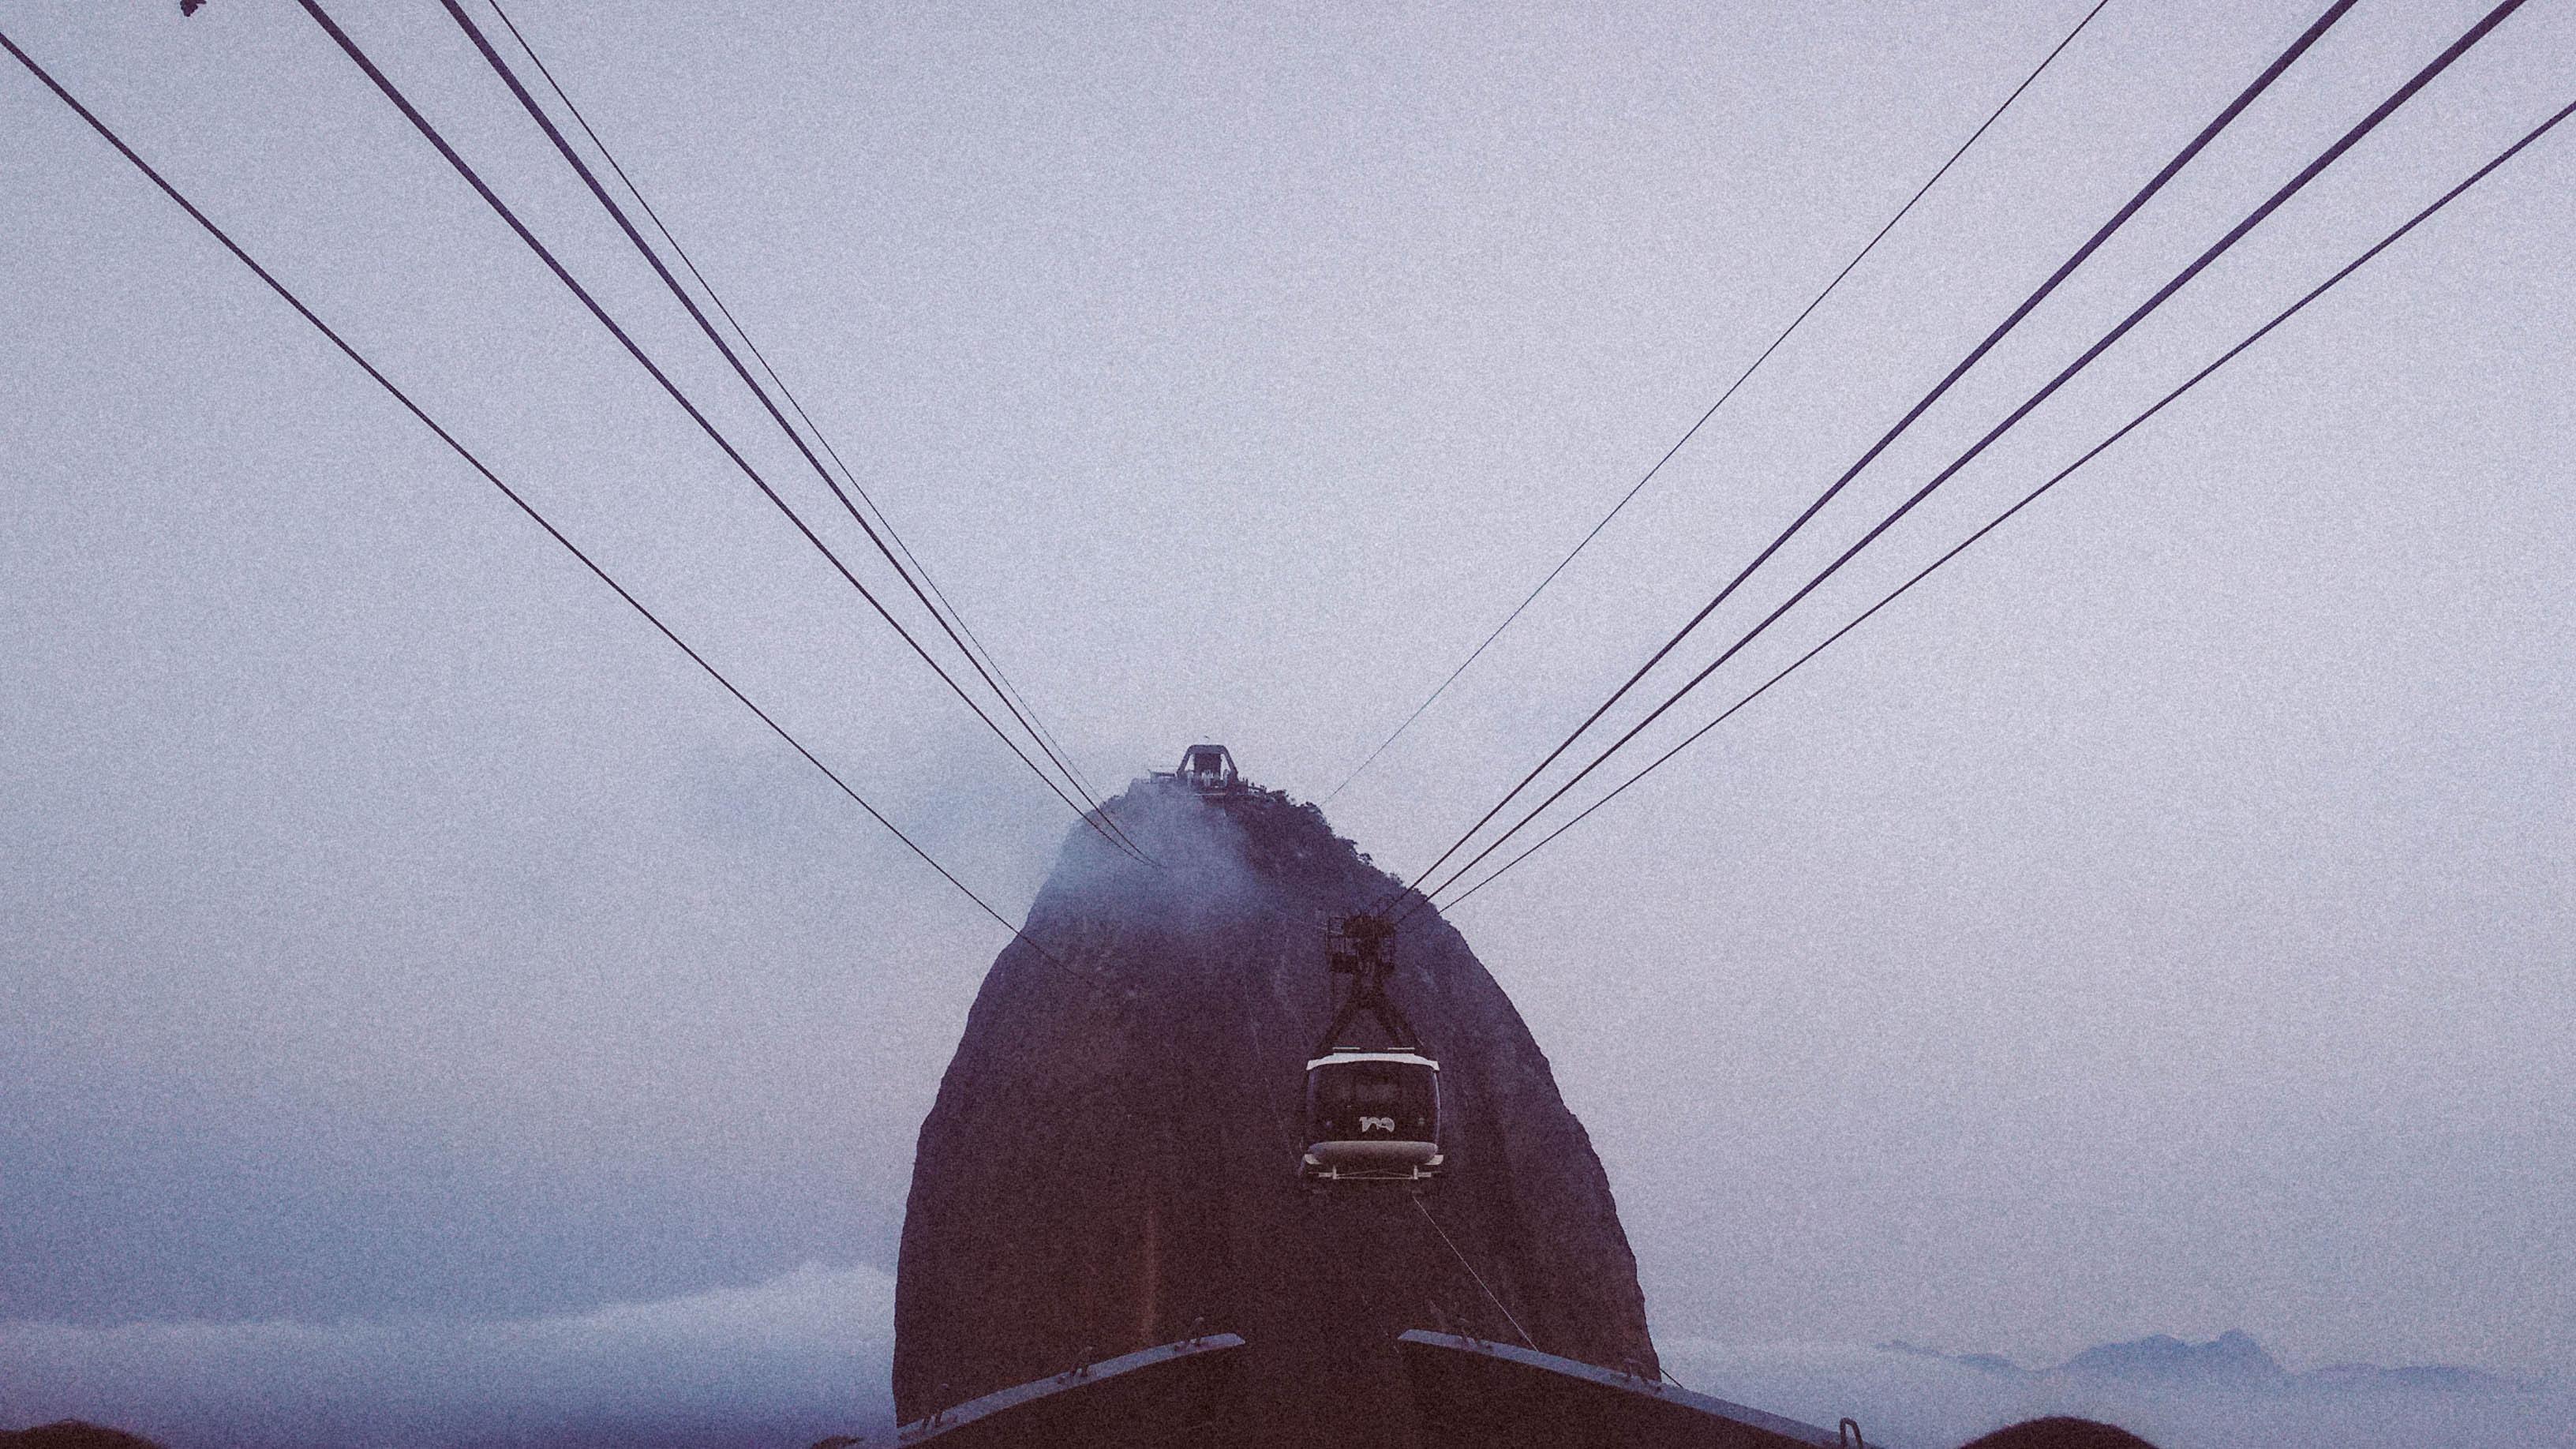 Free Unsplash photo from Gláuber Sampaio